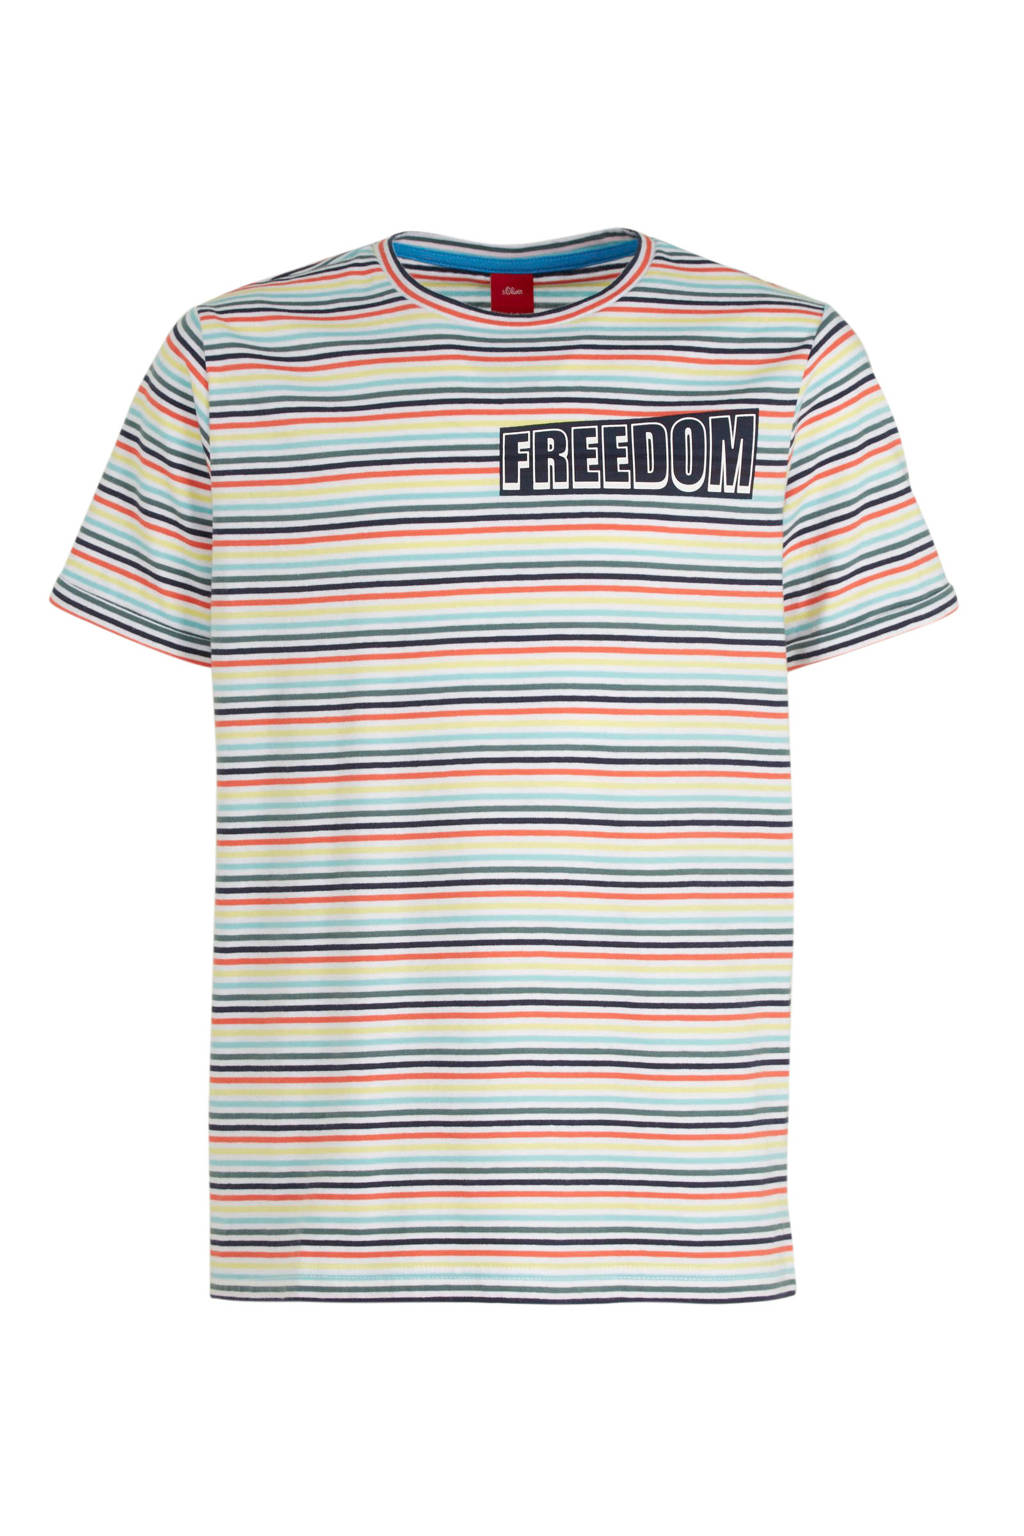 s.Oliver gestreept T-shirt wit/geel/rood, Wit/geel/rood